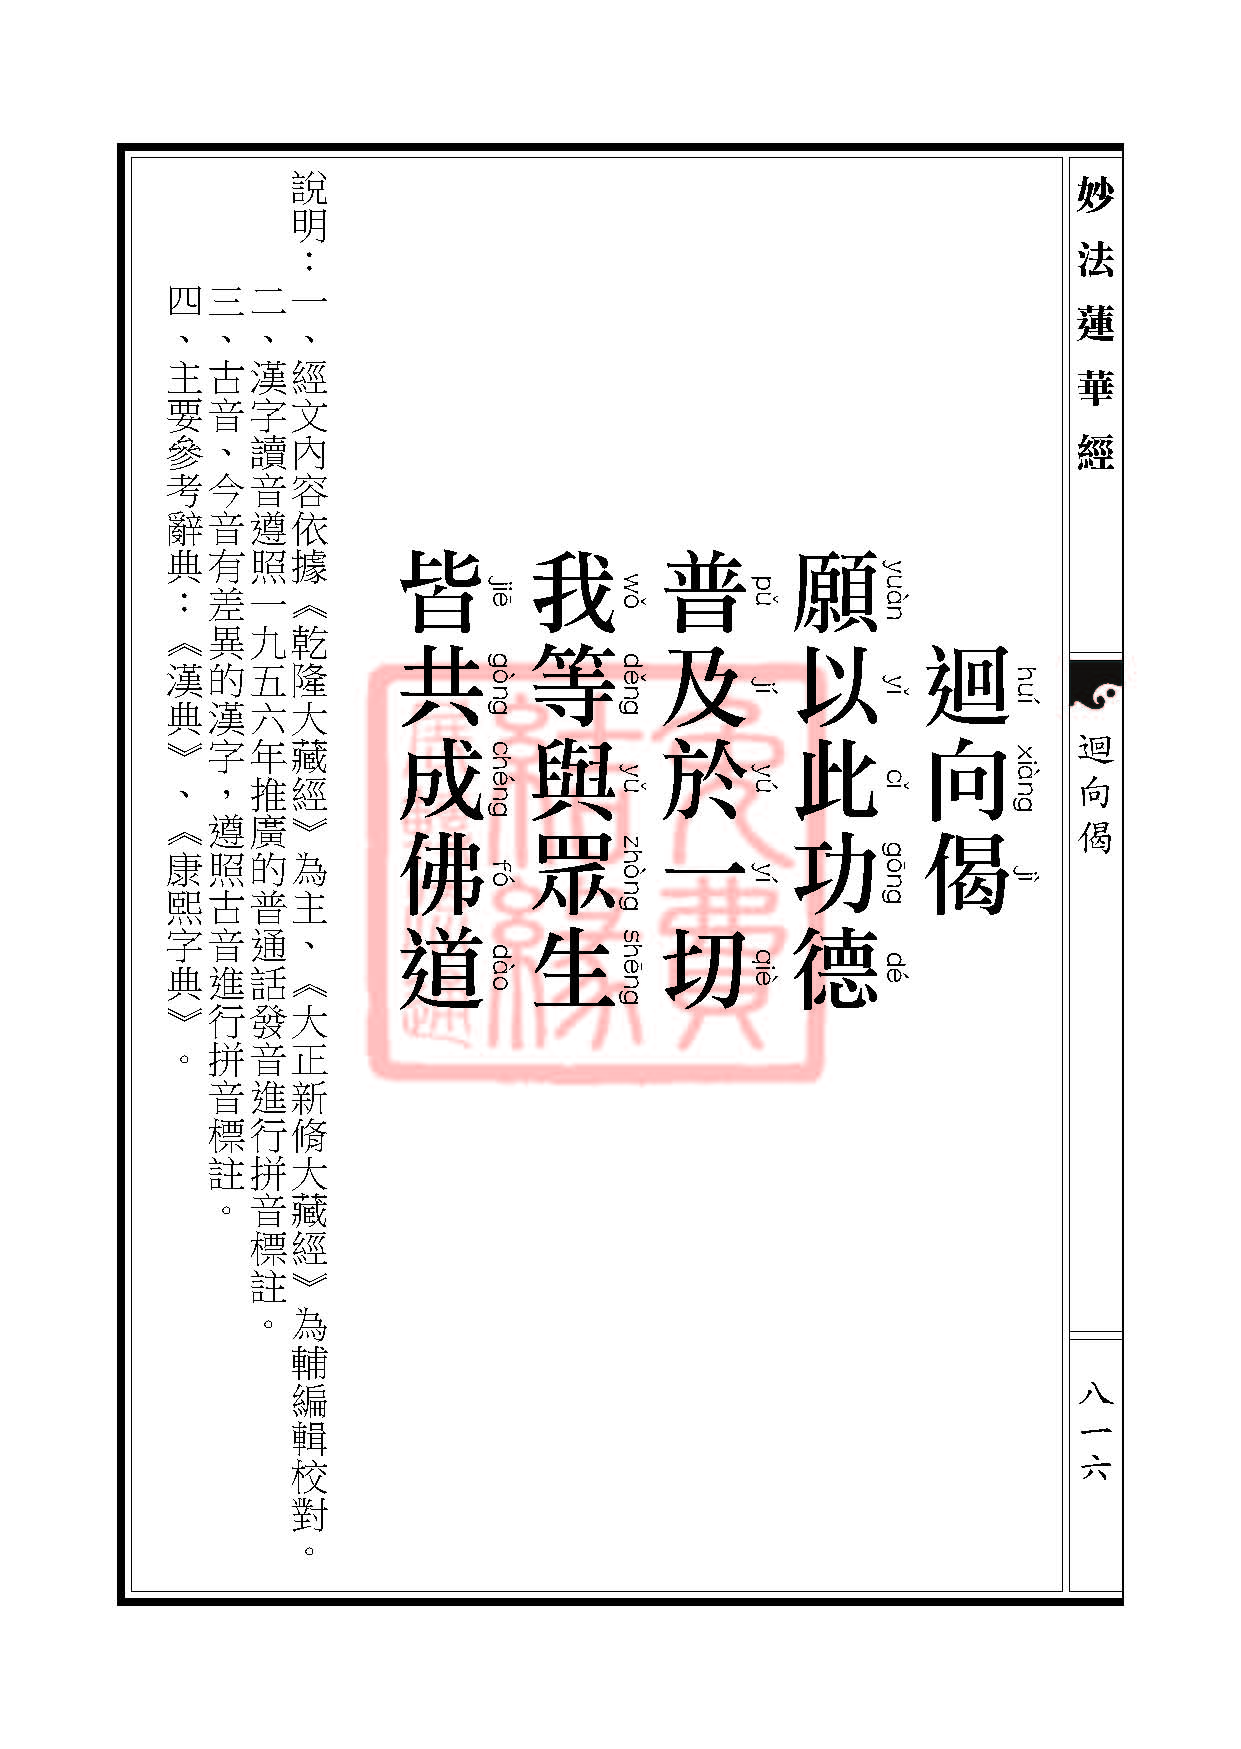 Book_FHJ_HK-A6-PY_Web_页面_816.jpg